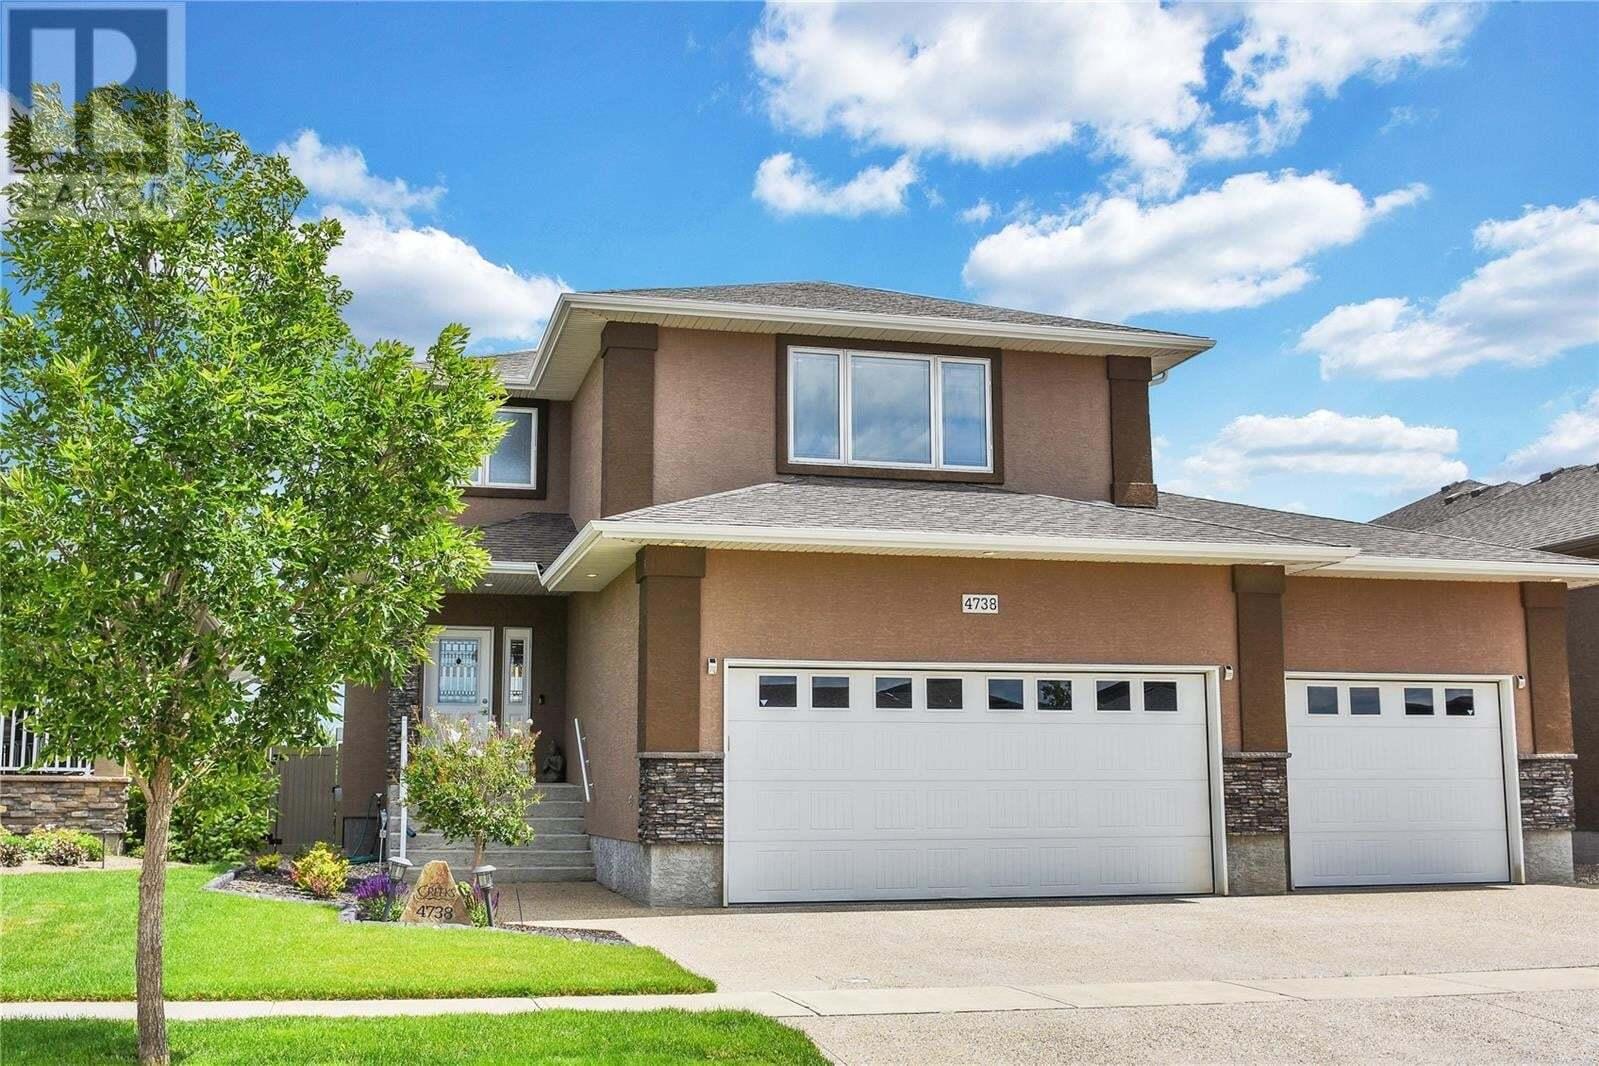 House for sale at 4738 Sandpiper Cres E Regina Saskatchewan - MLS: SK817608